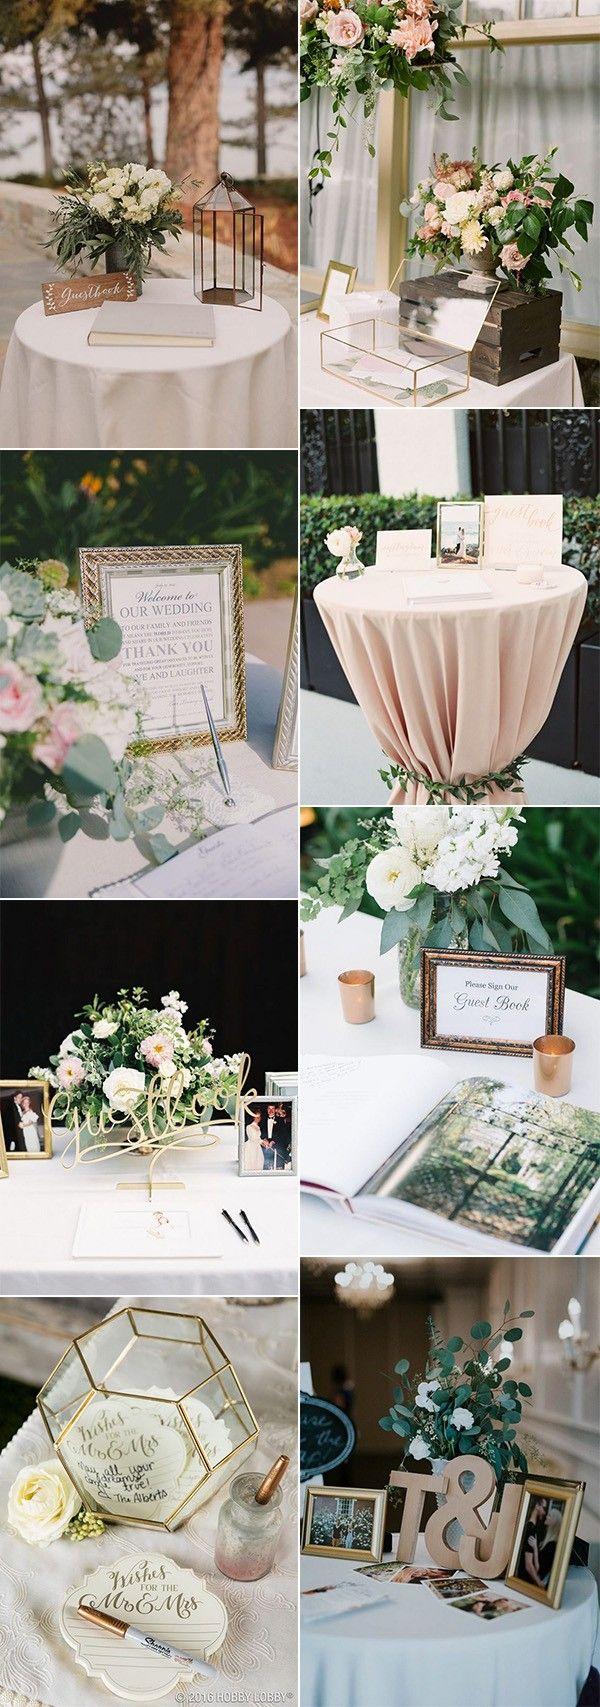 Pre wedding party table decorations february 2019  best Wedding Ideas images on Pinterest  Wedding ideas